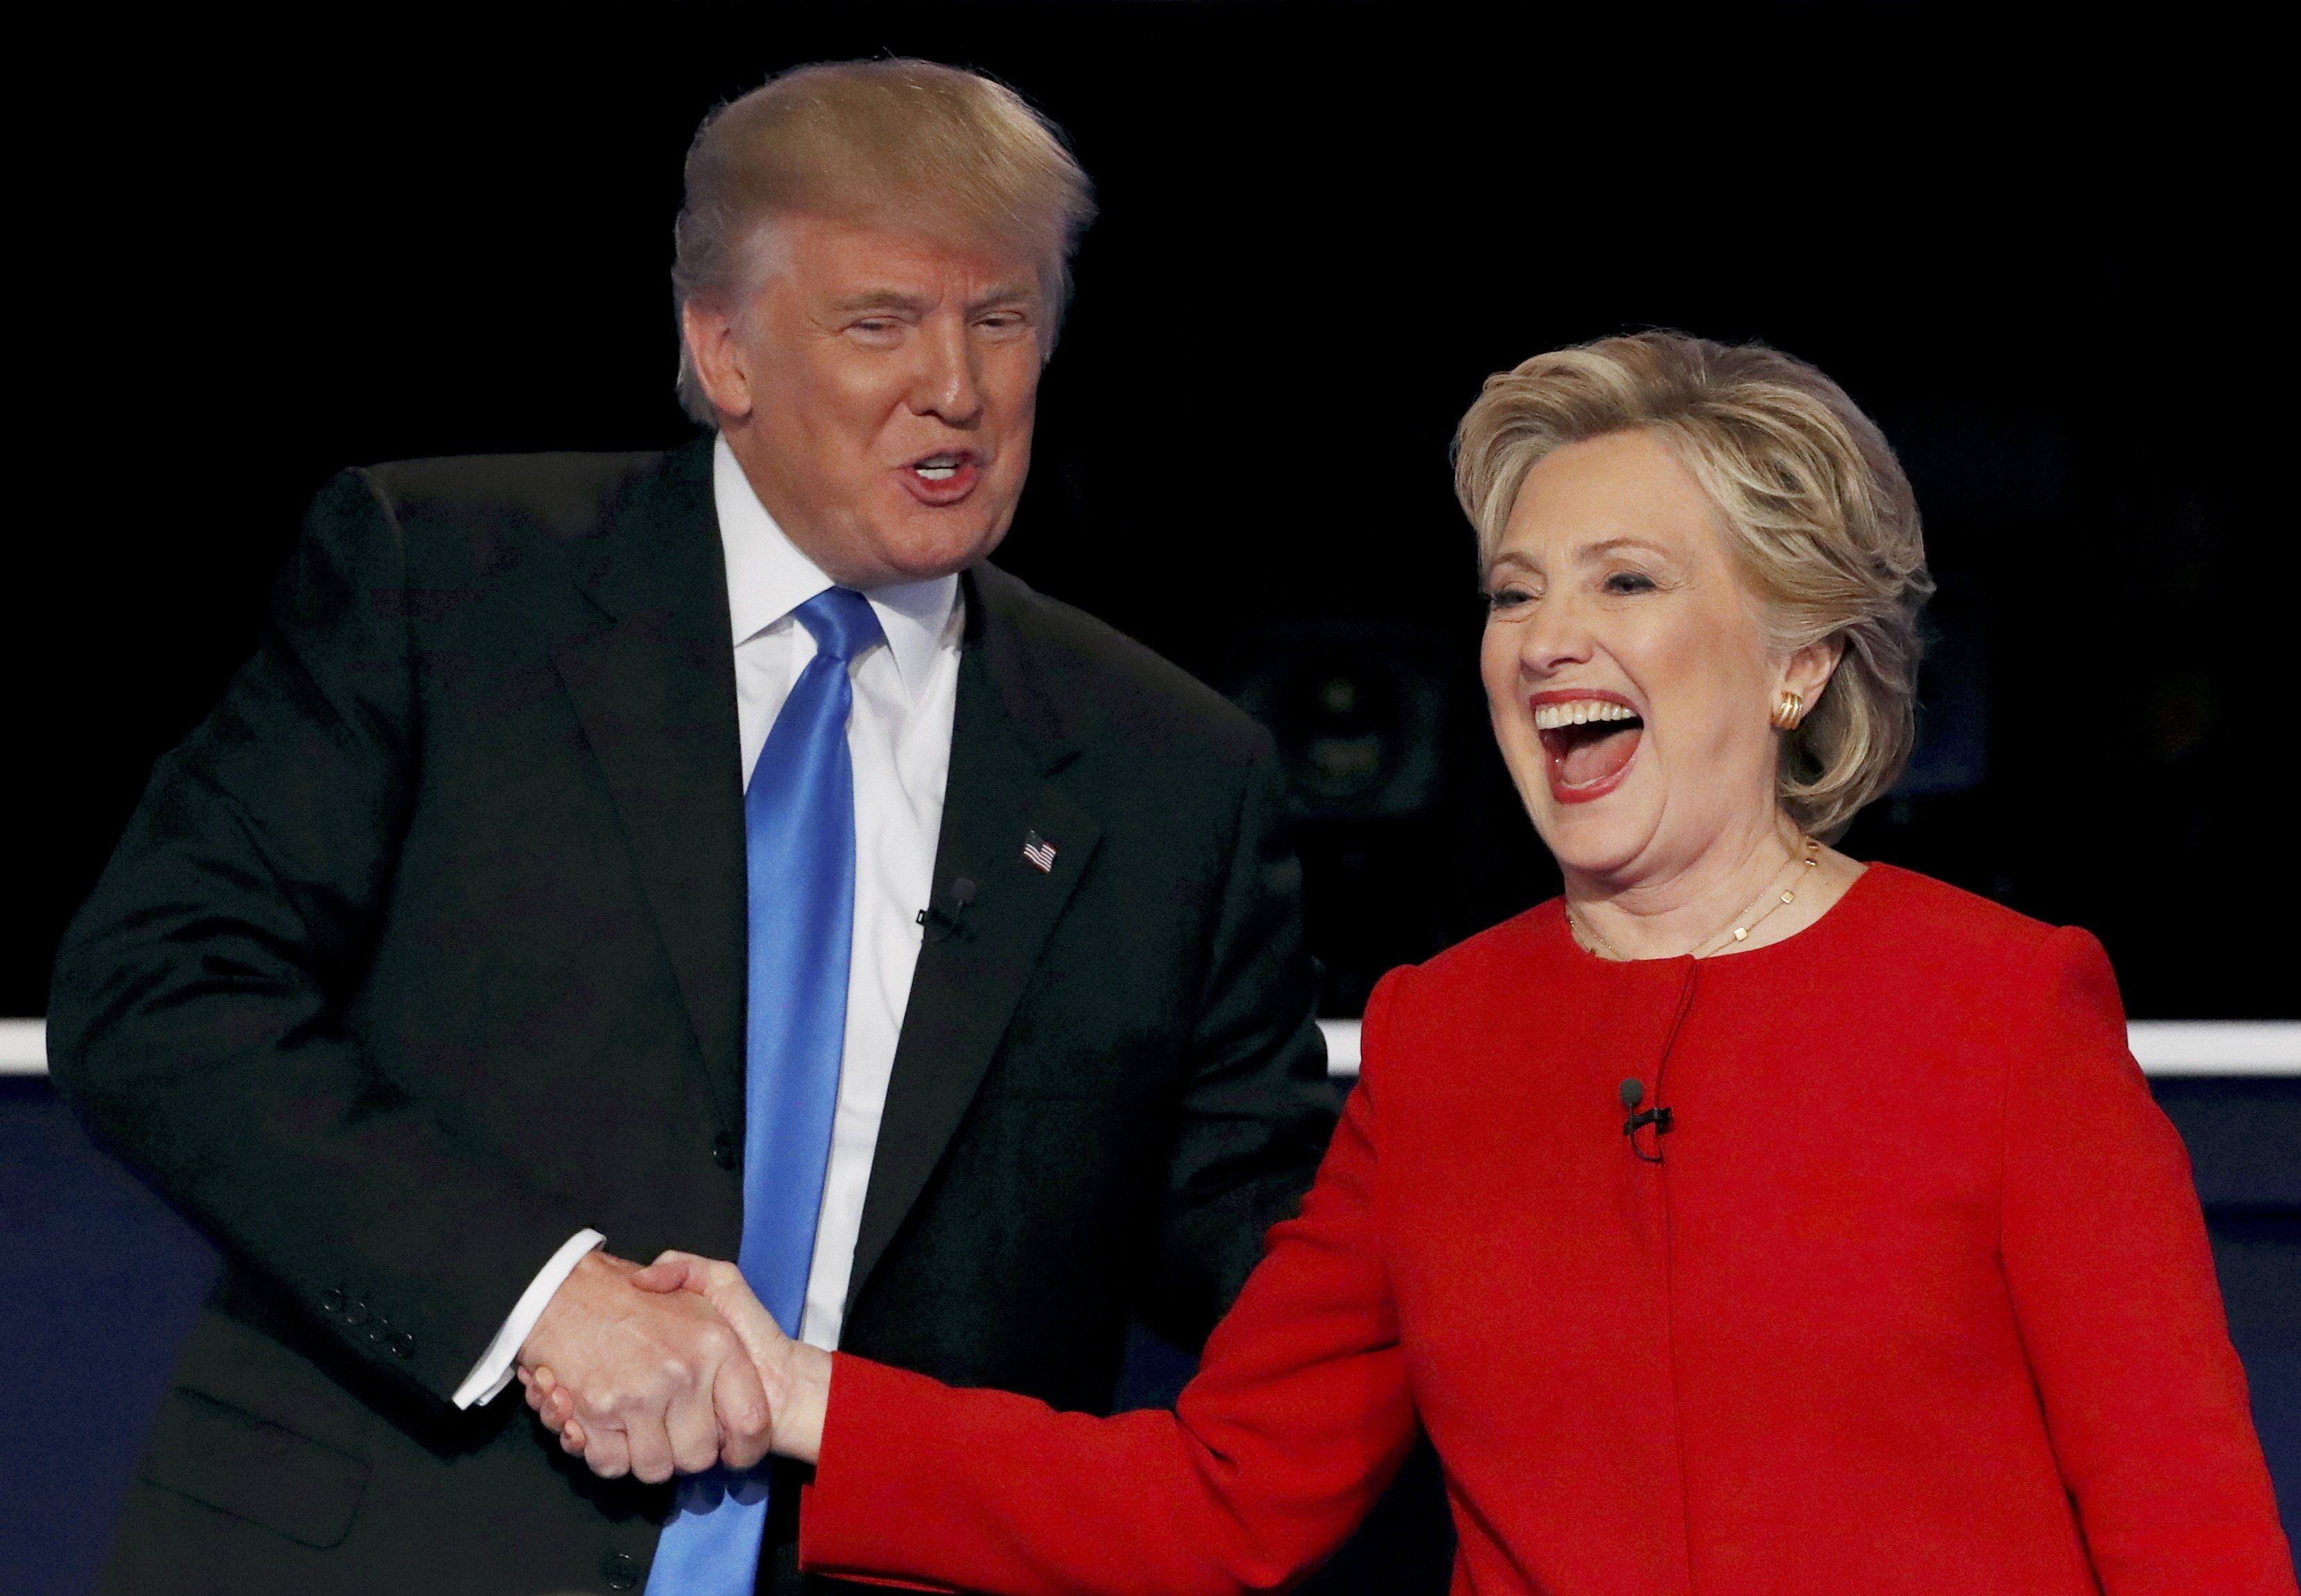 Трамп обвинил Хиллари Клинтон в сговоре с РФ